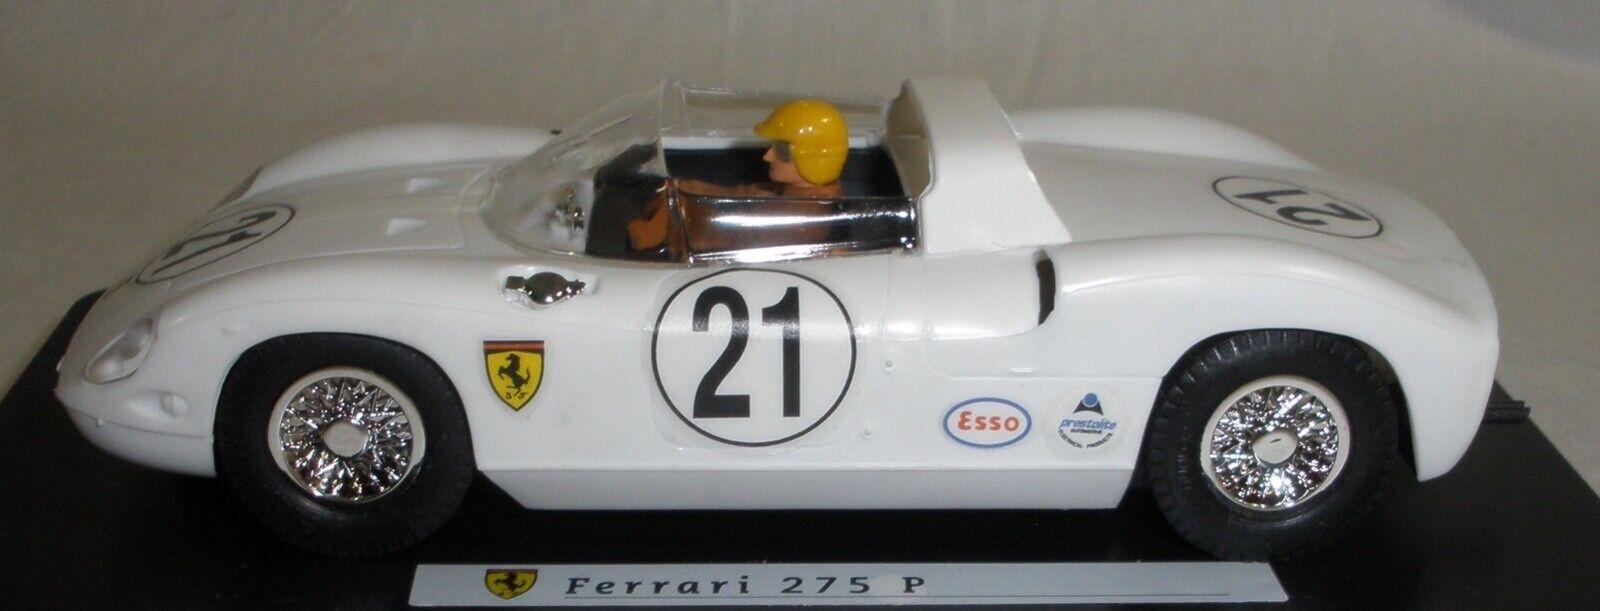 MRRC Ferrari 275 P vit 1 32 slot bil Collectors Quality Condition